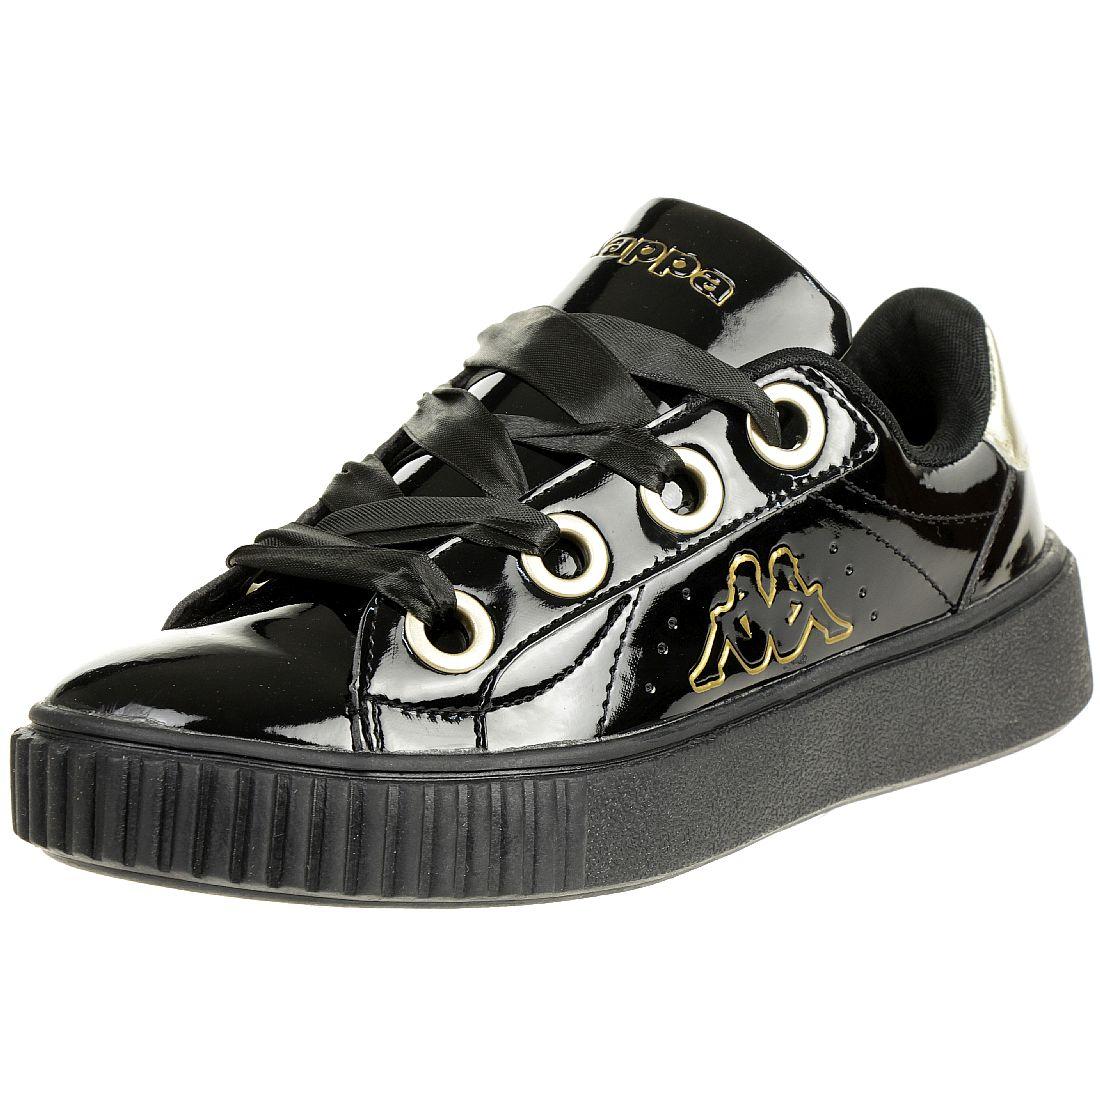 Bikkembergs Sneaker für Damen 599372 SchwarzGold XW27D2HGO